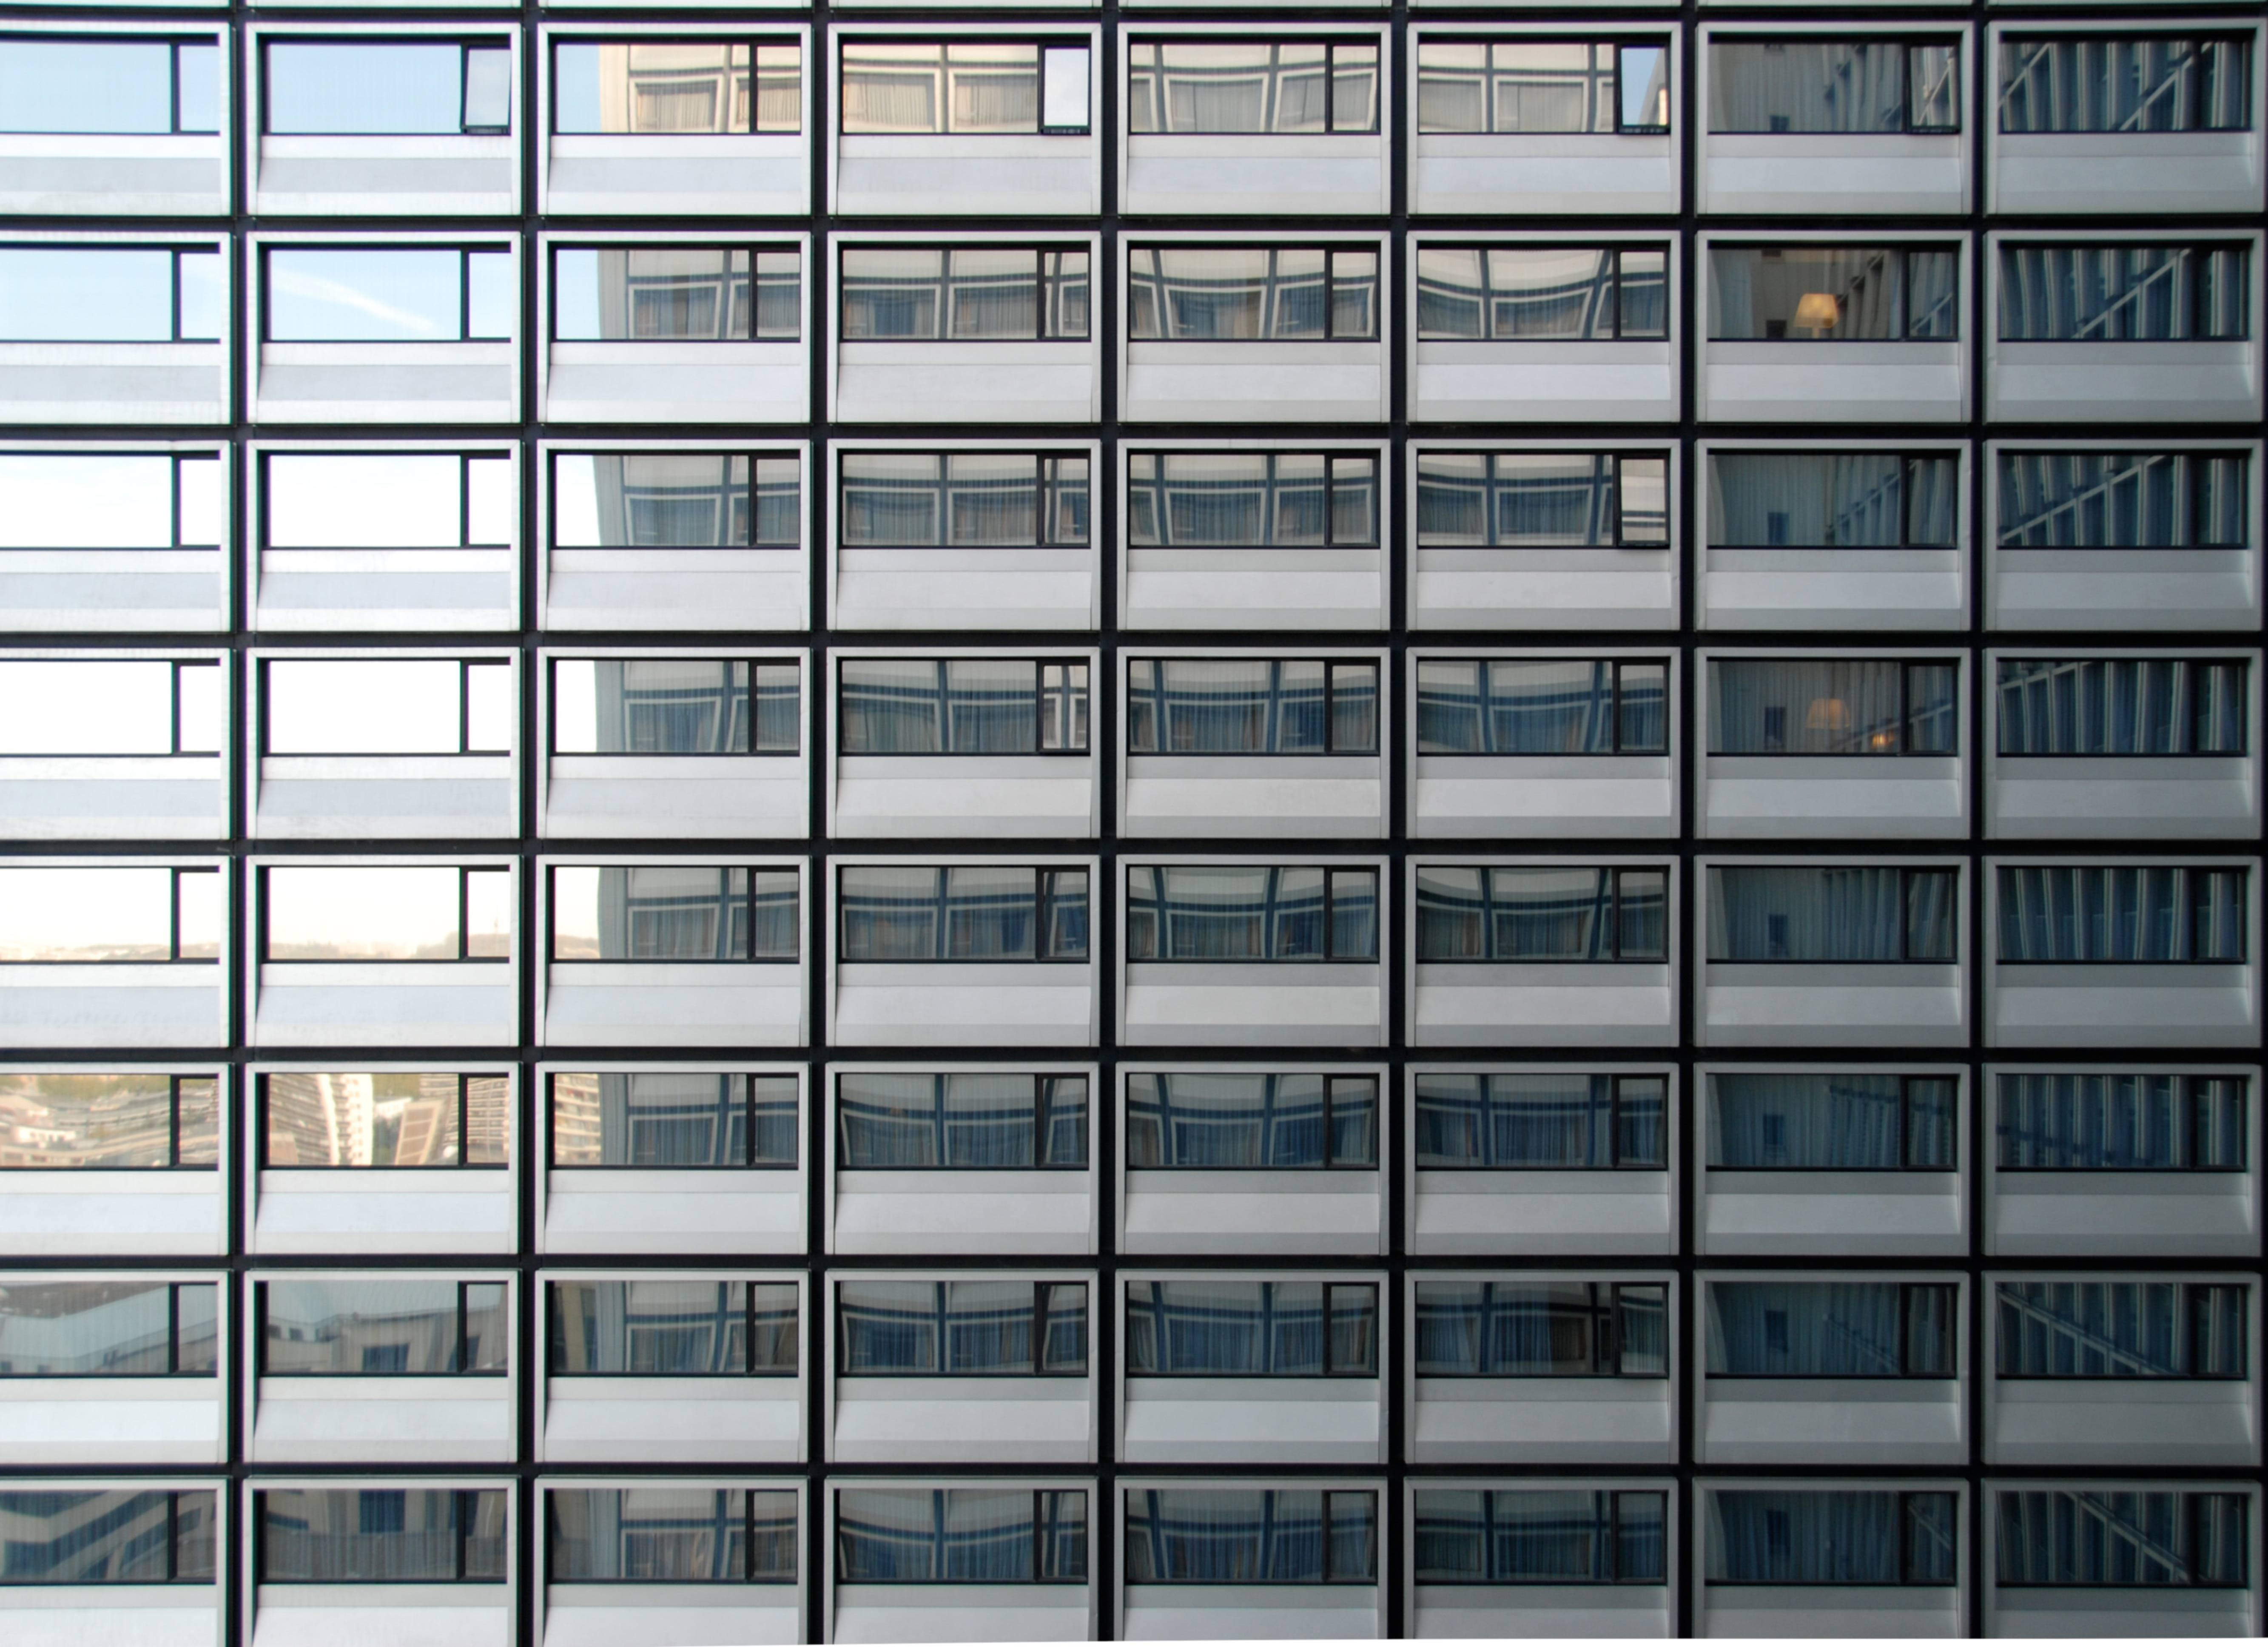 Skyscraper repetition photography